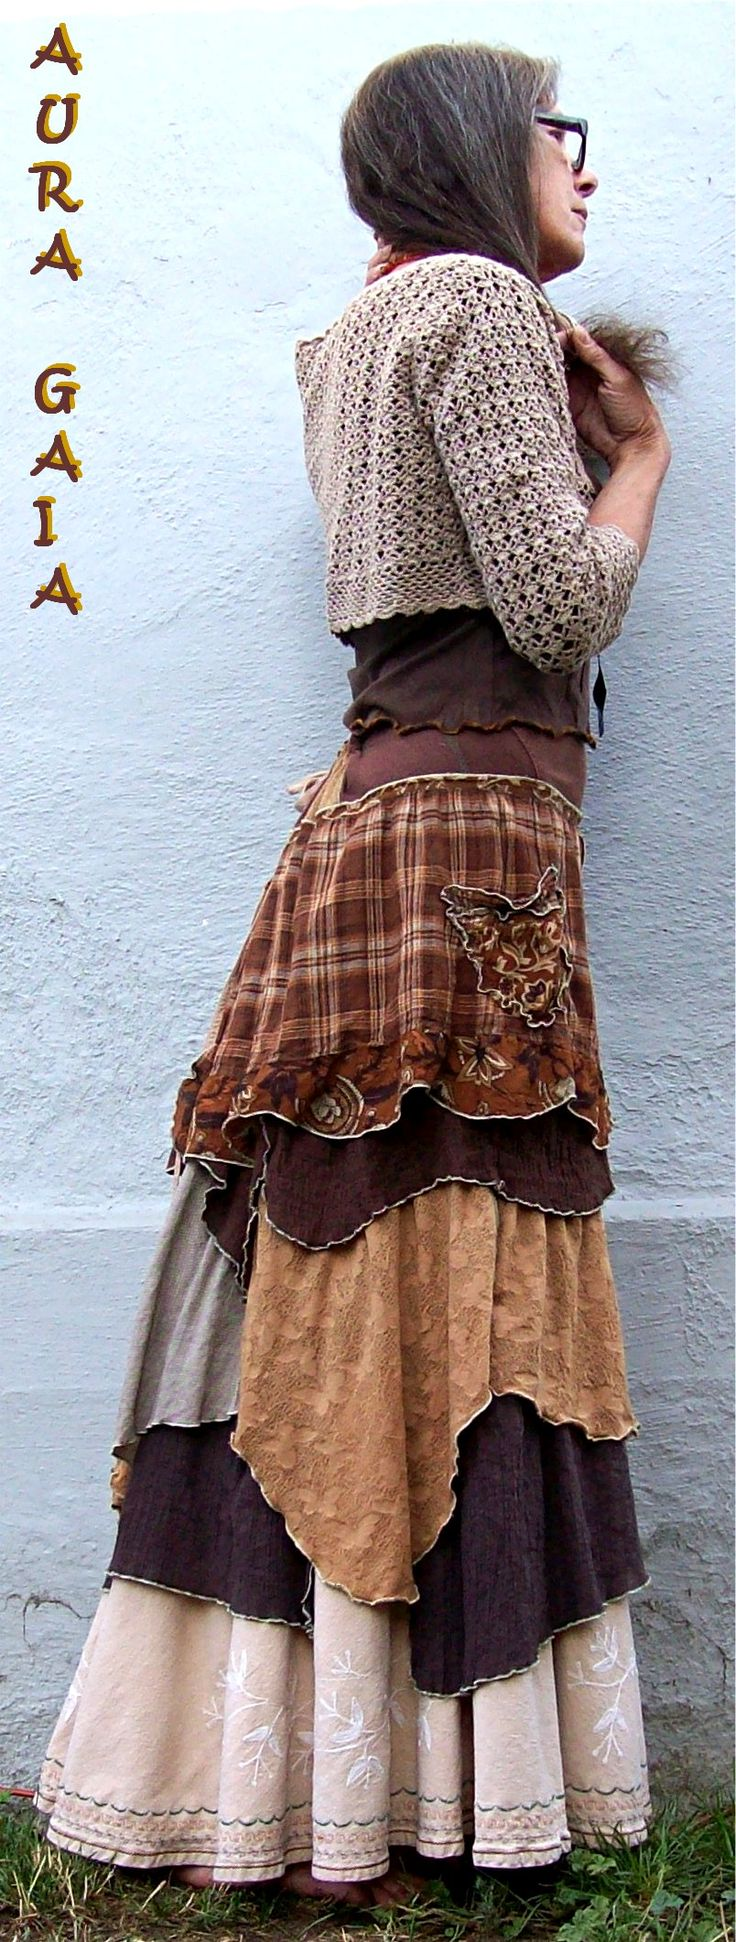 AuraGaia ~She's Complicated~ Poorgirl Upcycled Bustleback Skirt fits XS-2X Plus